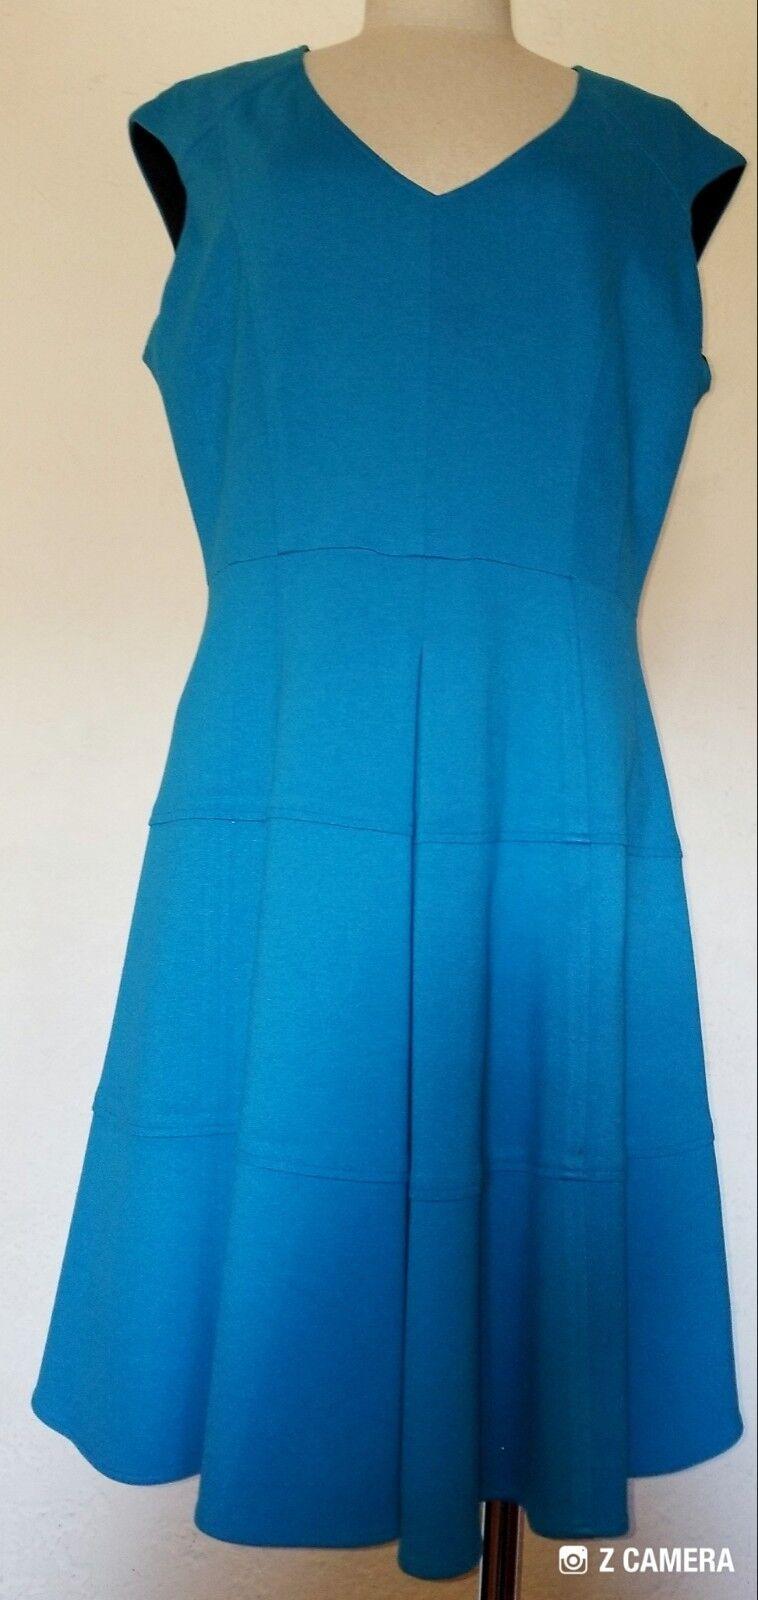 Nanette Lepore Turquoise Swing Dress Size 12